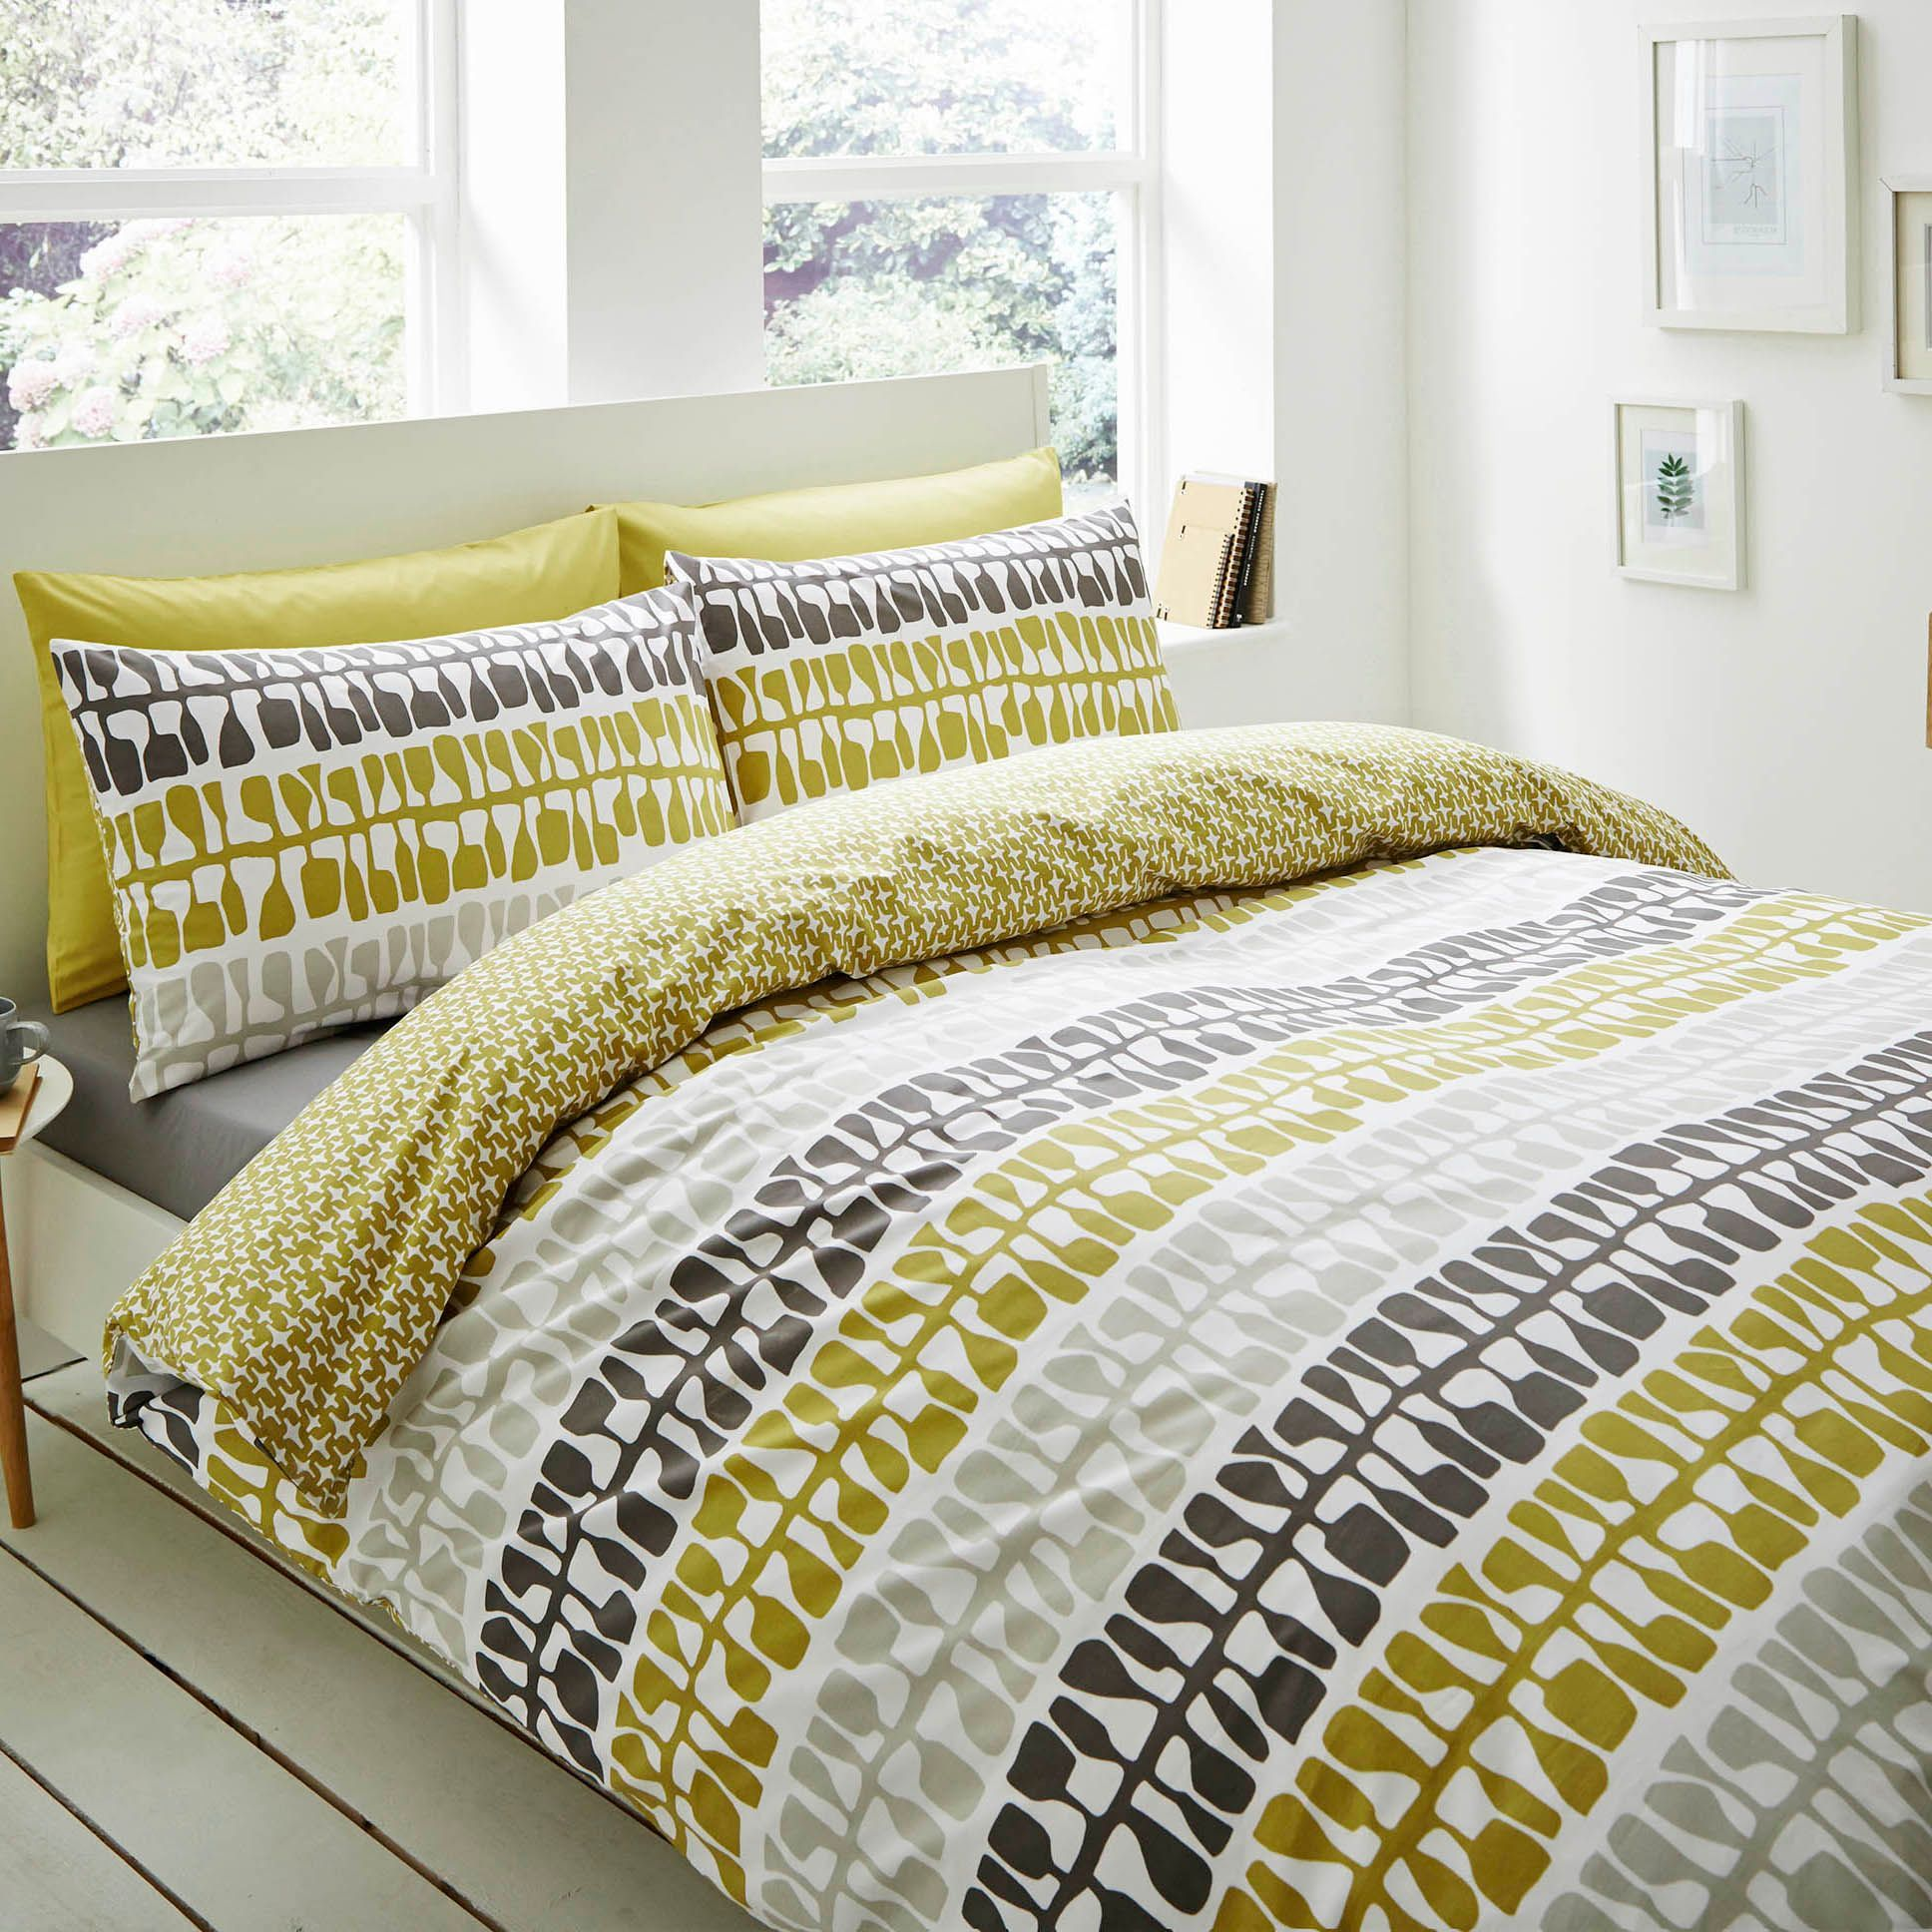 Lotta Jansdotter Follie Patterned Green King Size Bed Set